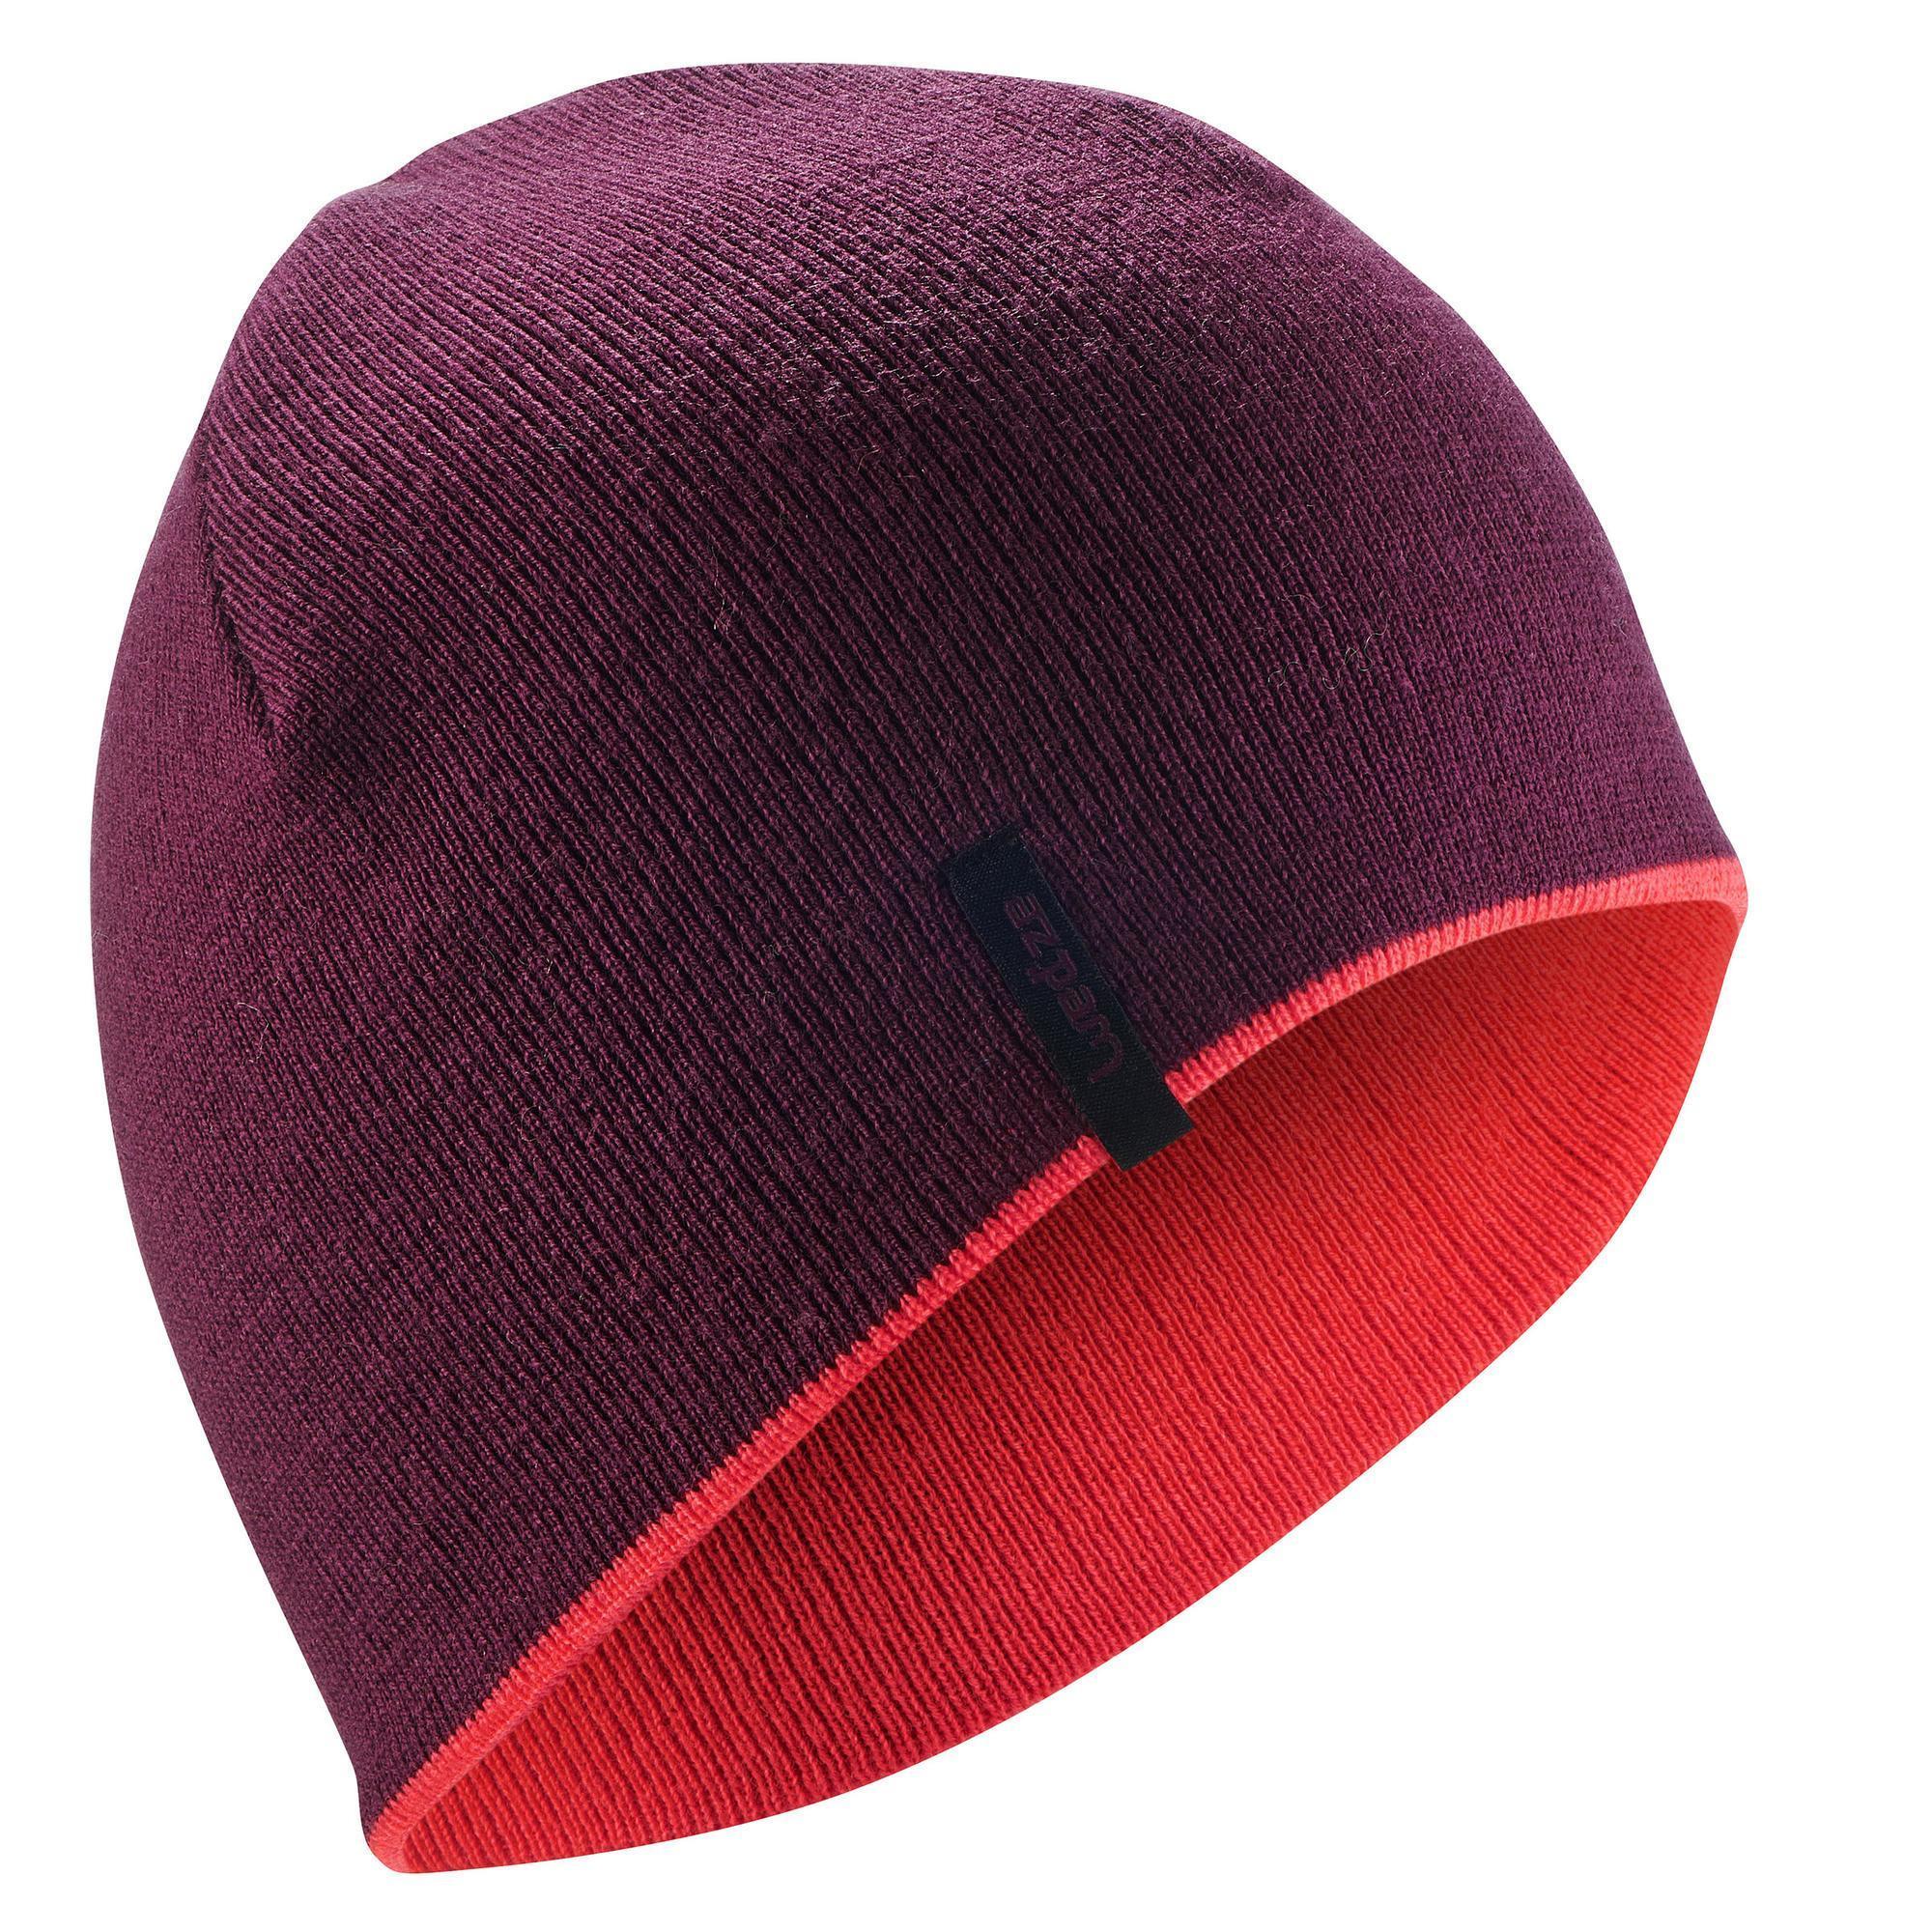 Skimütze Reverse violett/rosa | Accessoires > Mützen > Skimützen | Violett - Rosa | Wed'ze